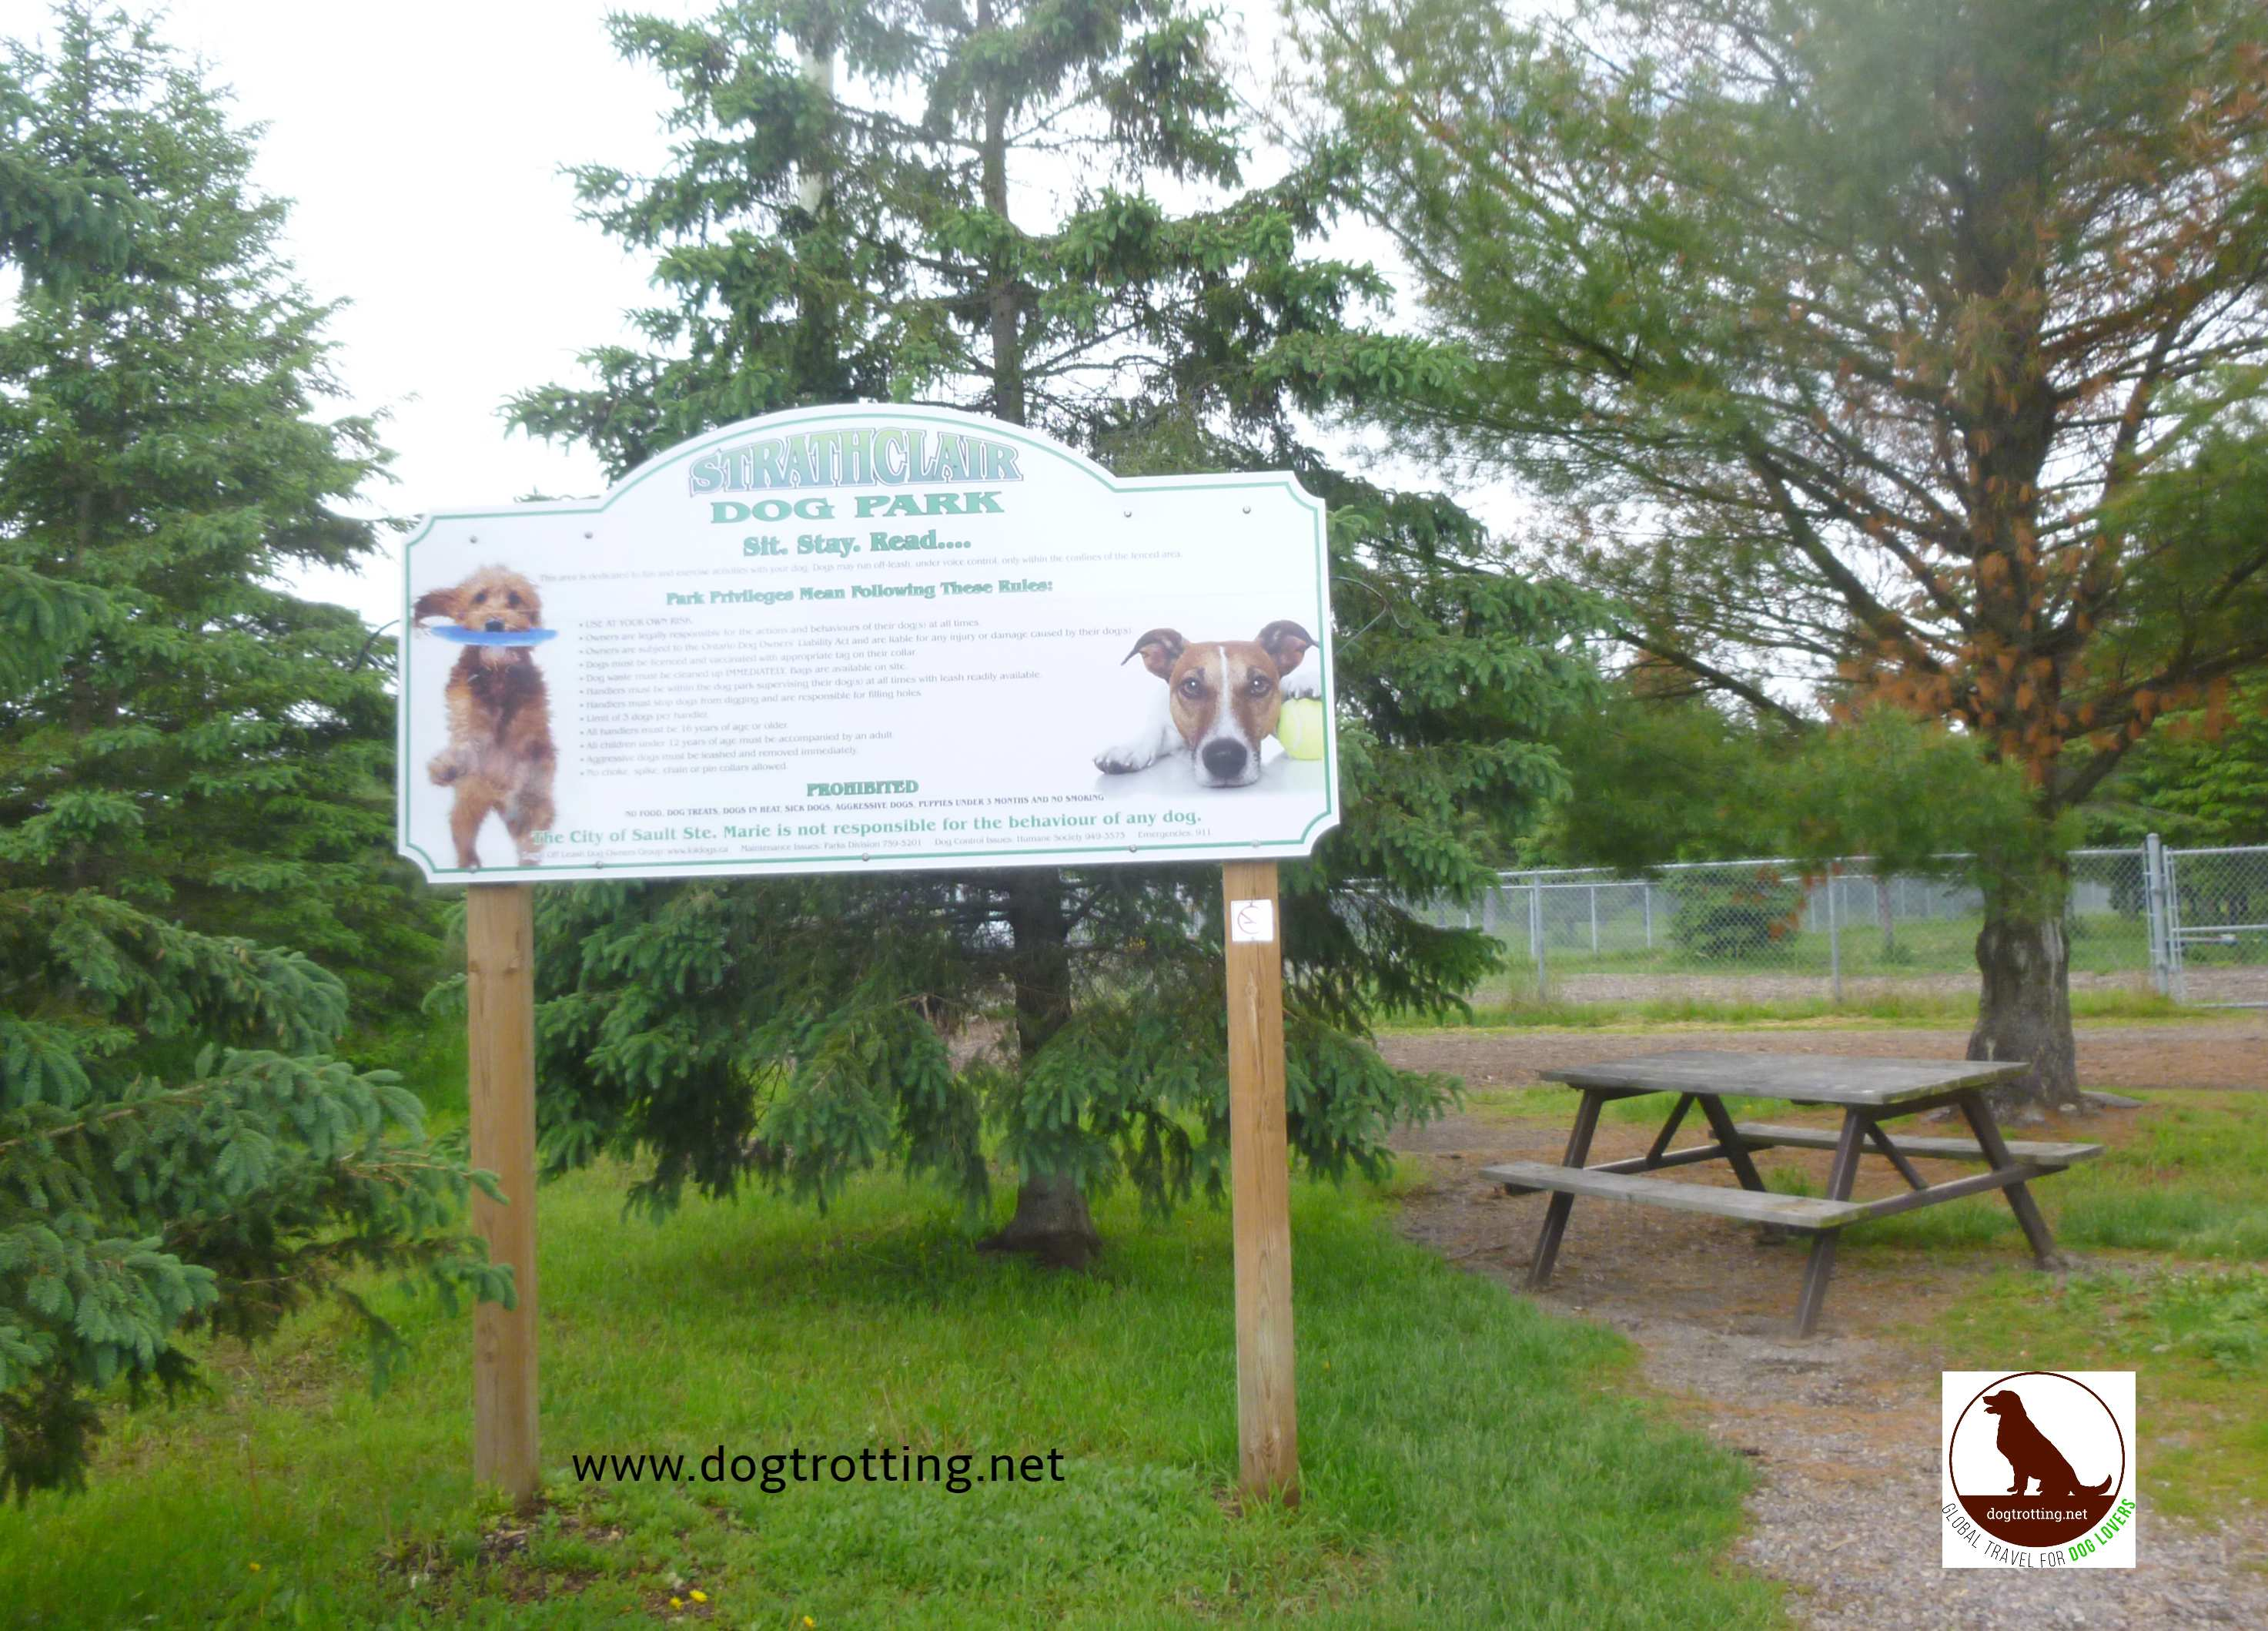 dogpark in Sault Ste. Marie, Ontario